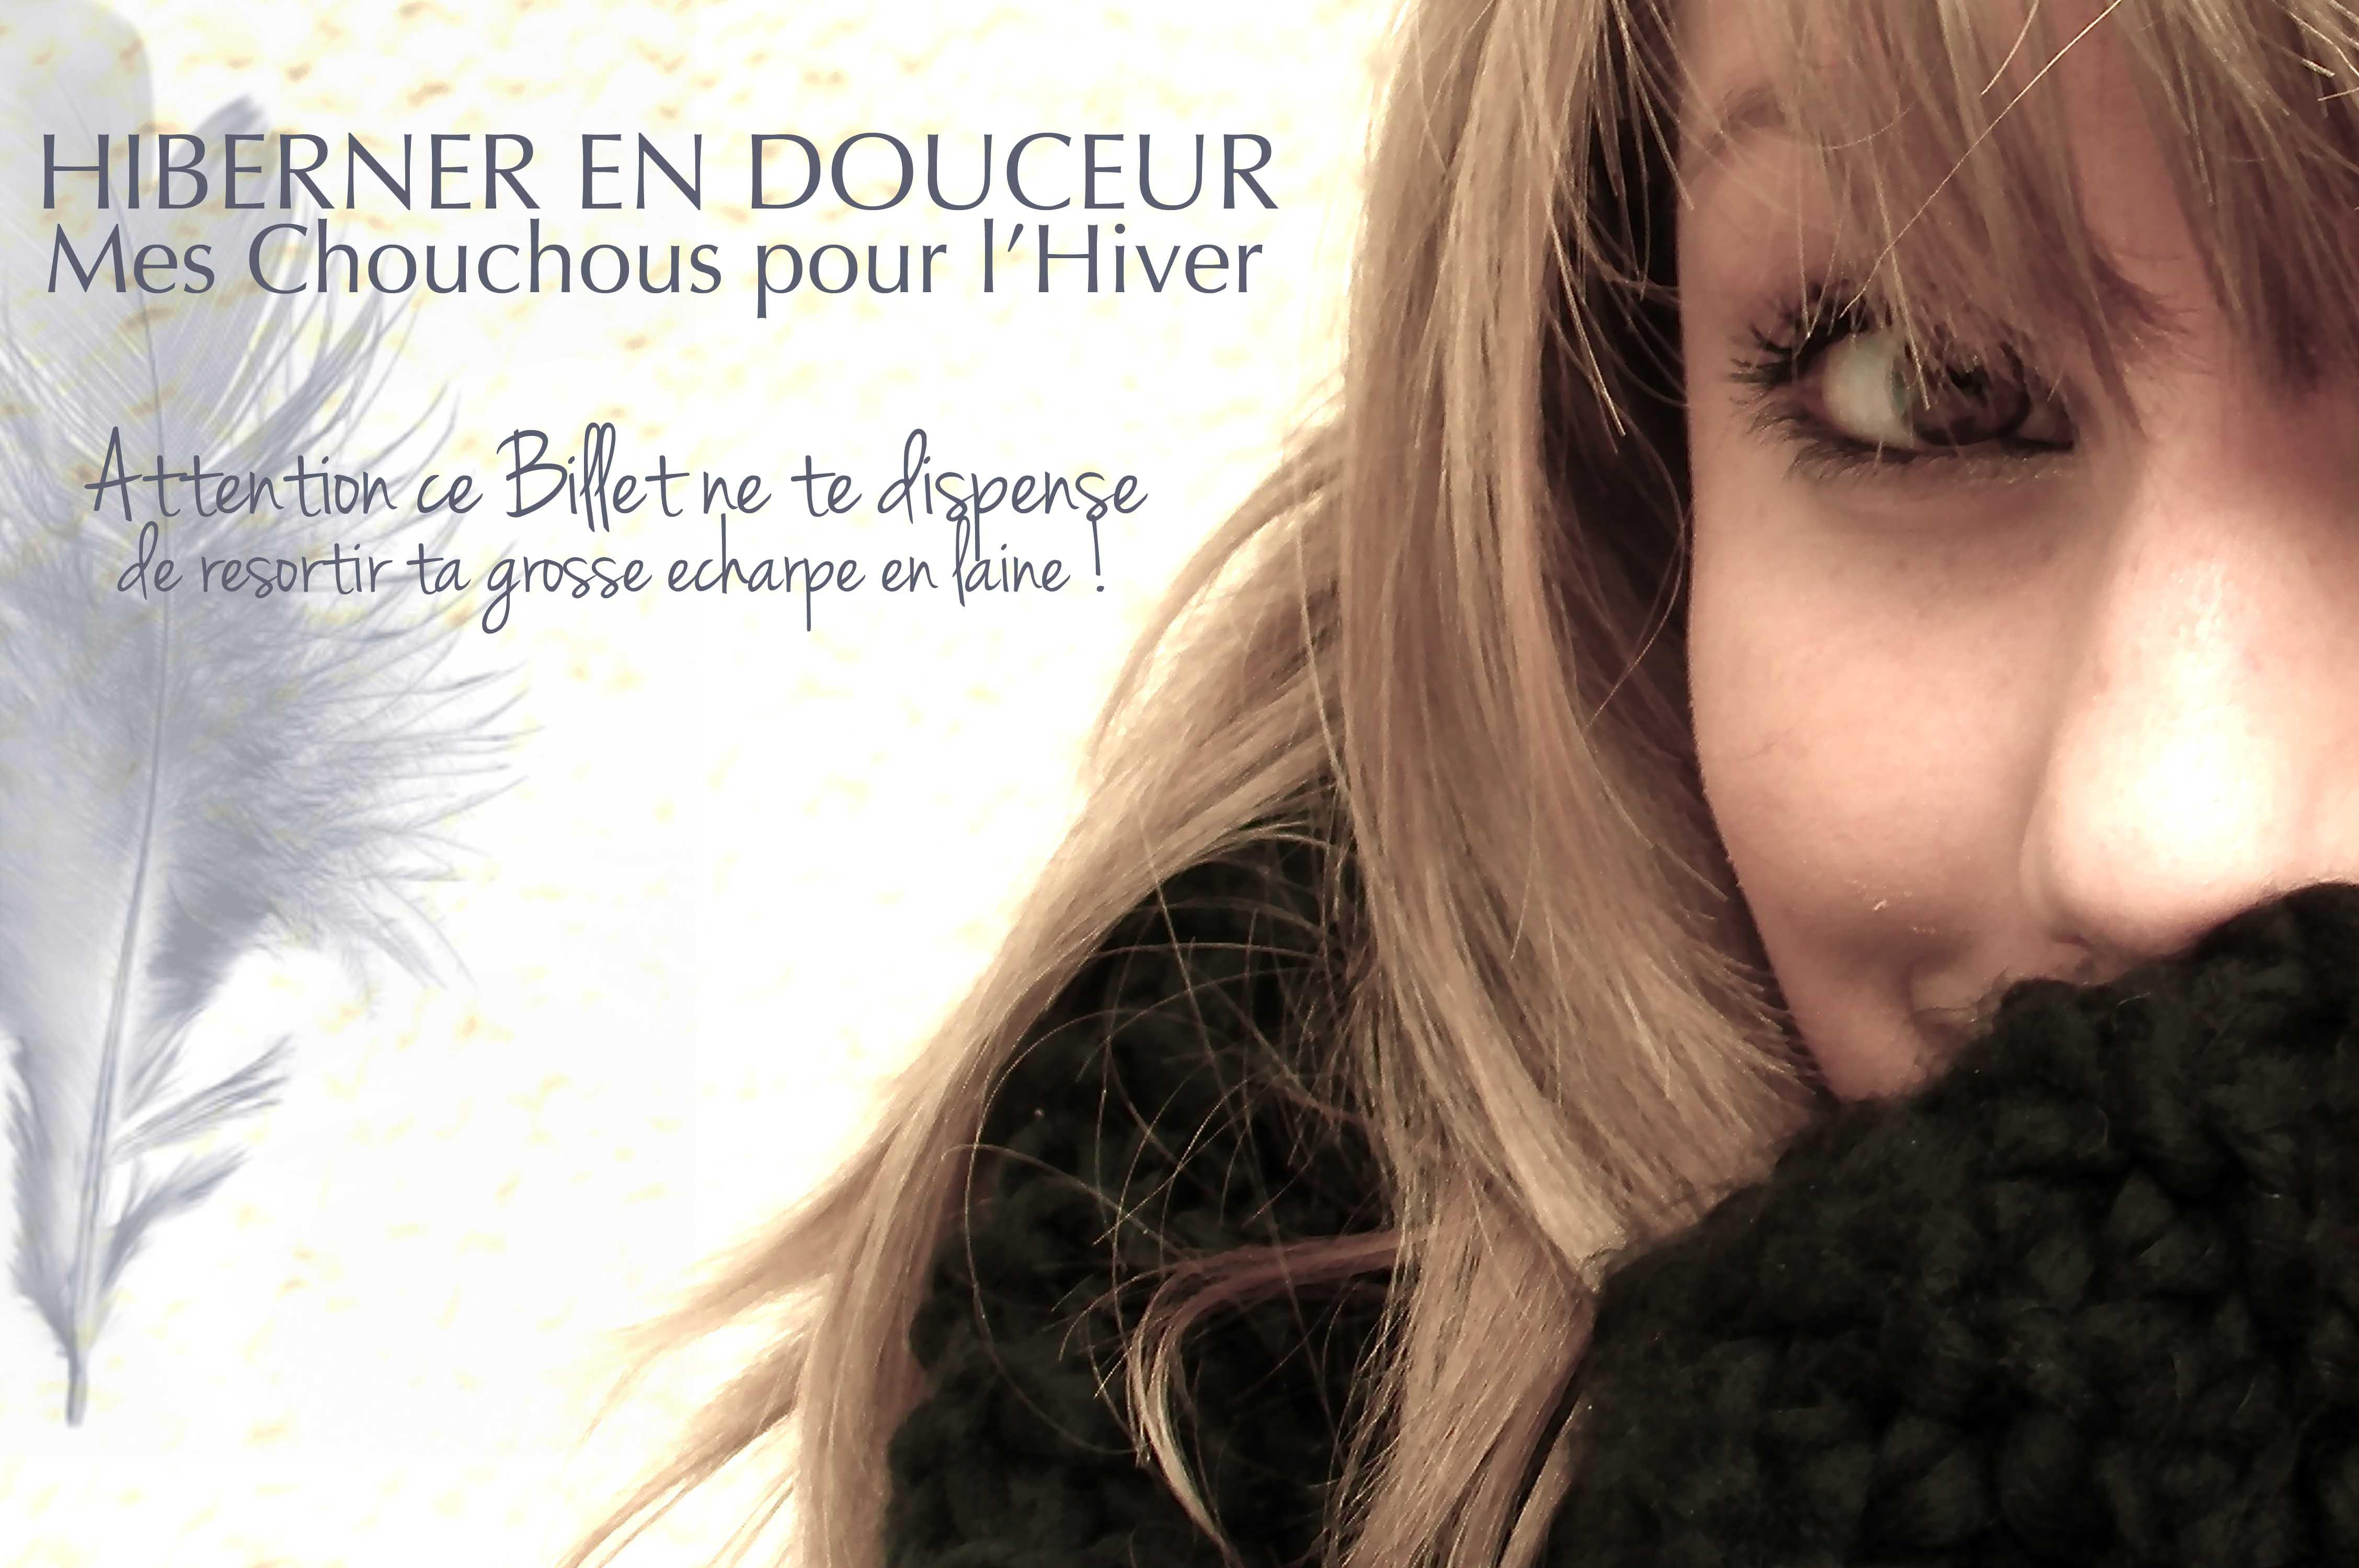 ALITTLEB_BLOG_BEAUTE_SOIN_COCOONING_HIBERNER_EN_DOUCEUR